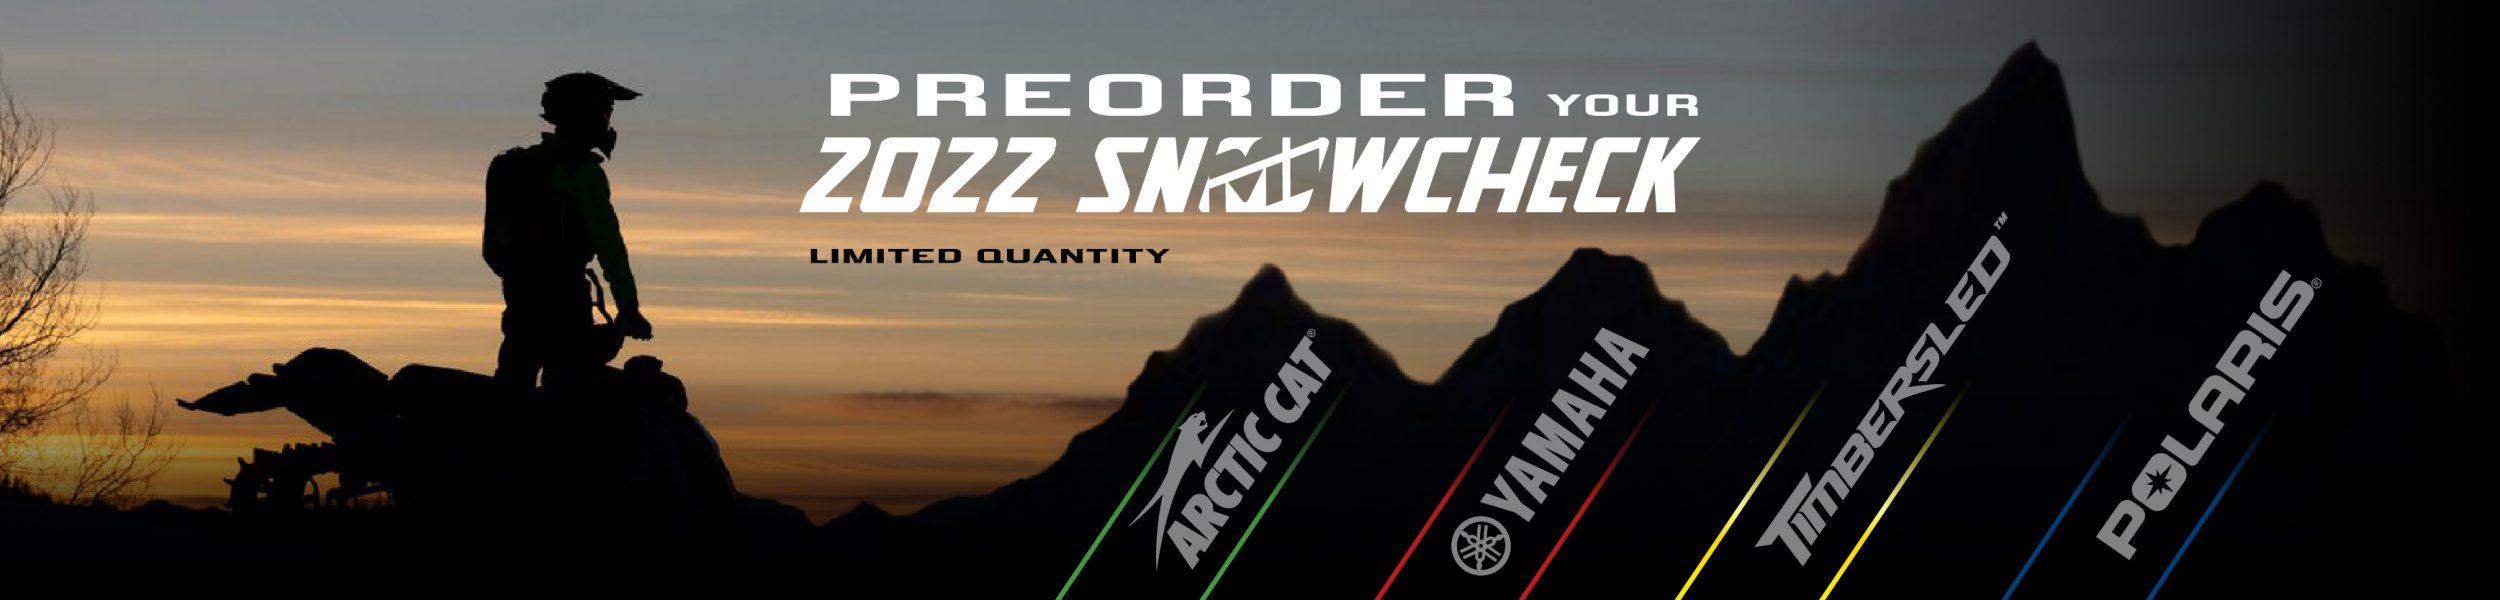 snowcheck 2022 – 4 brands